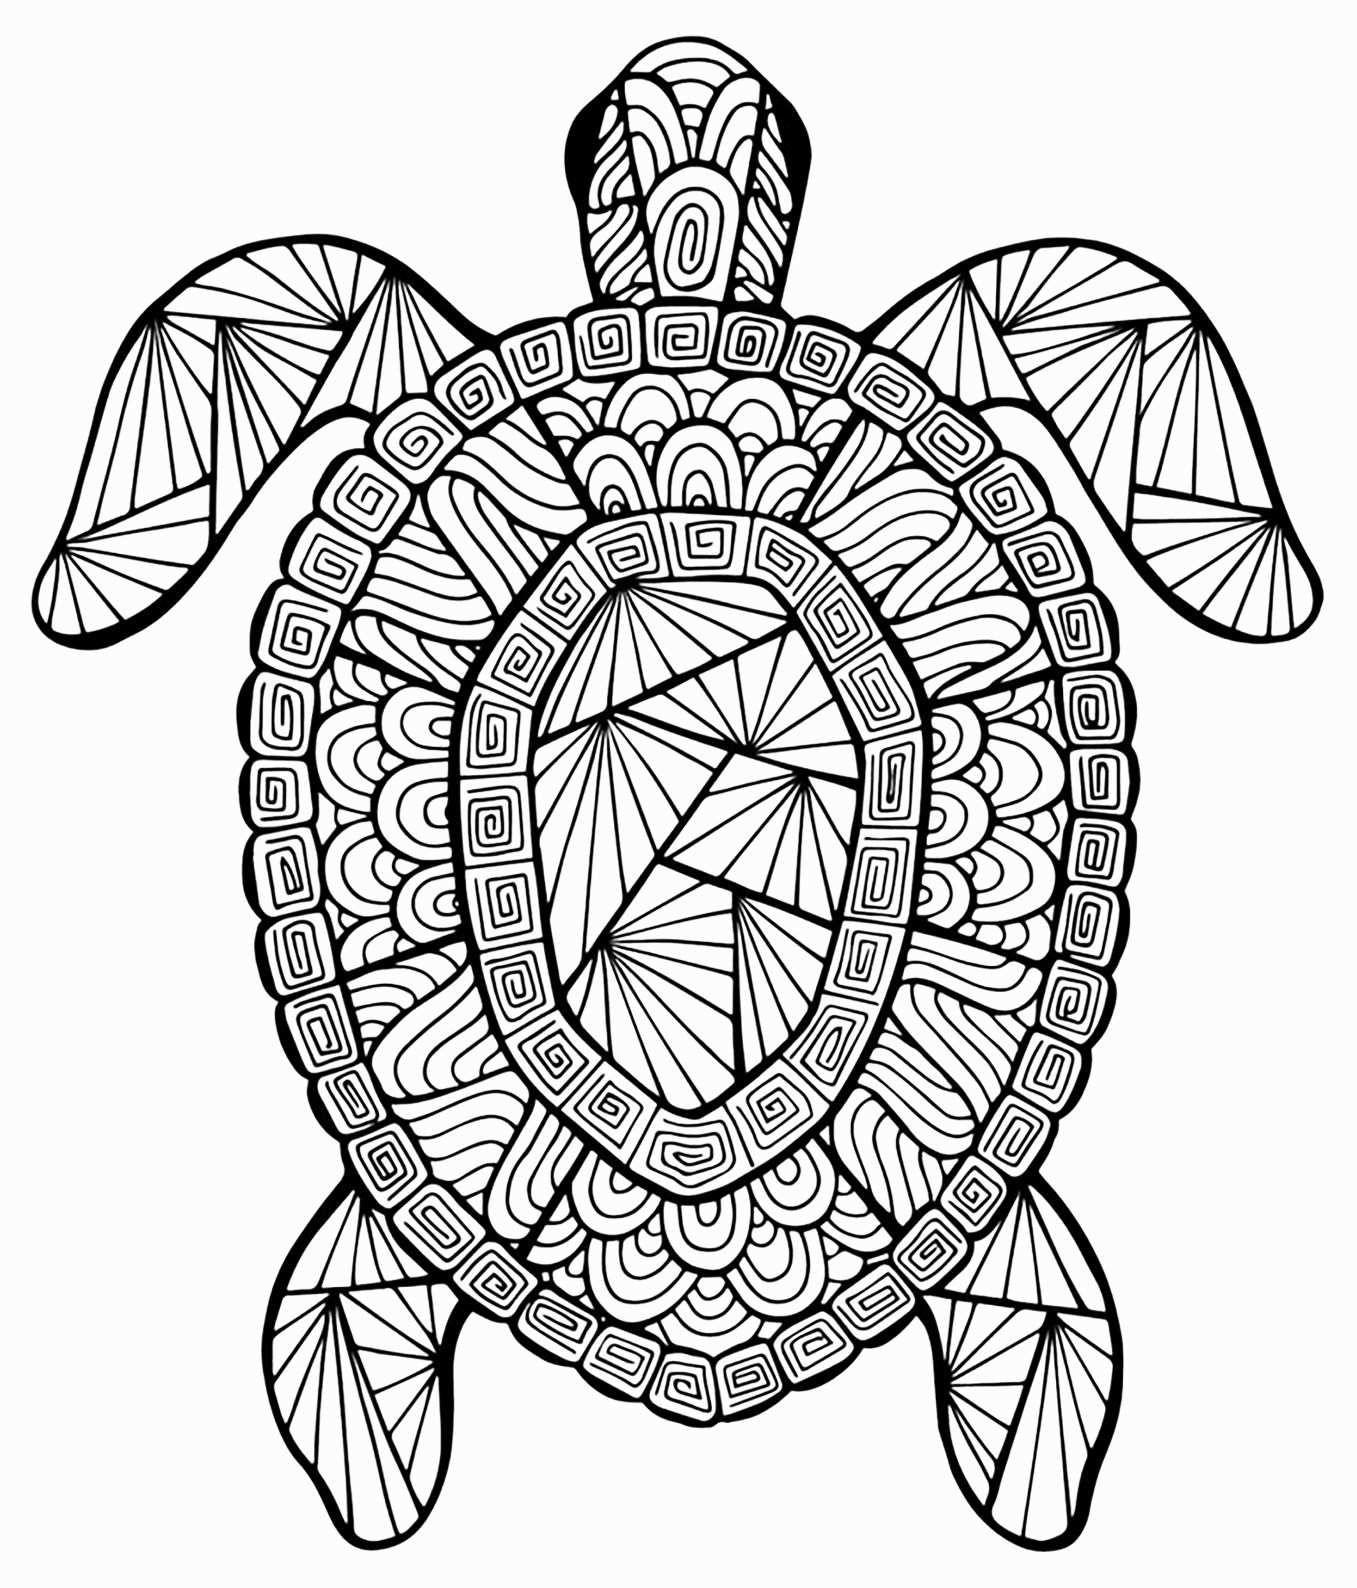 Epingle Sur Coloriage Mandala Animaux